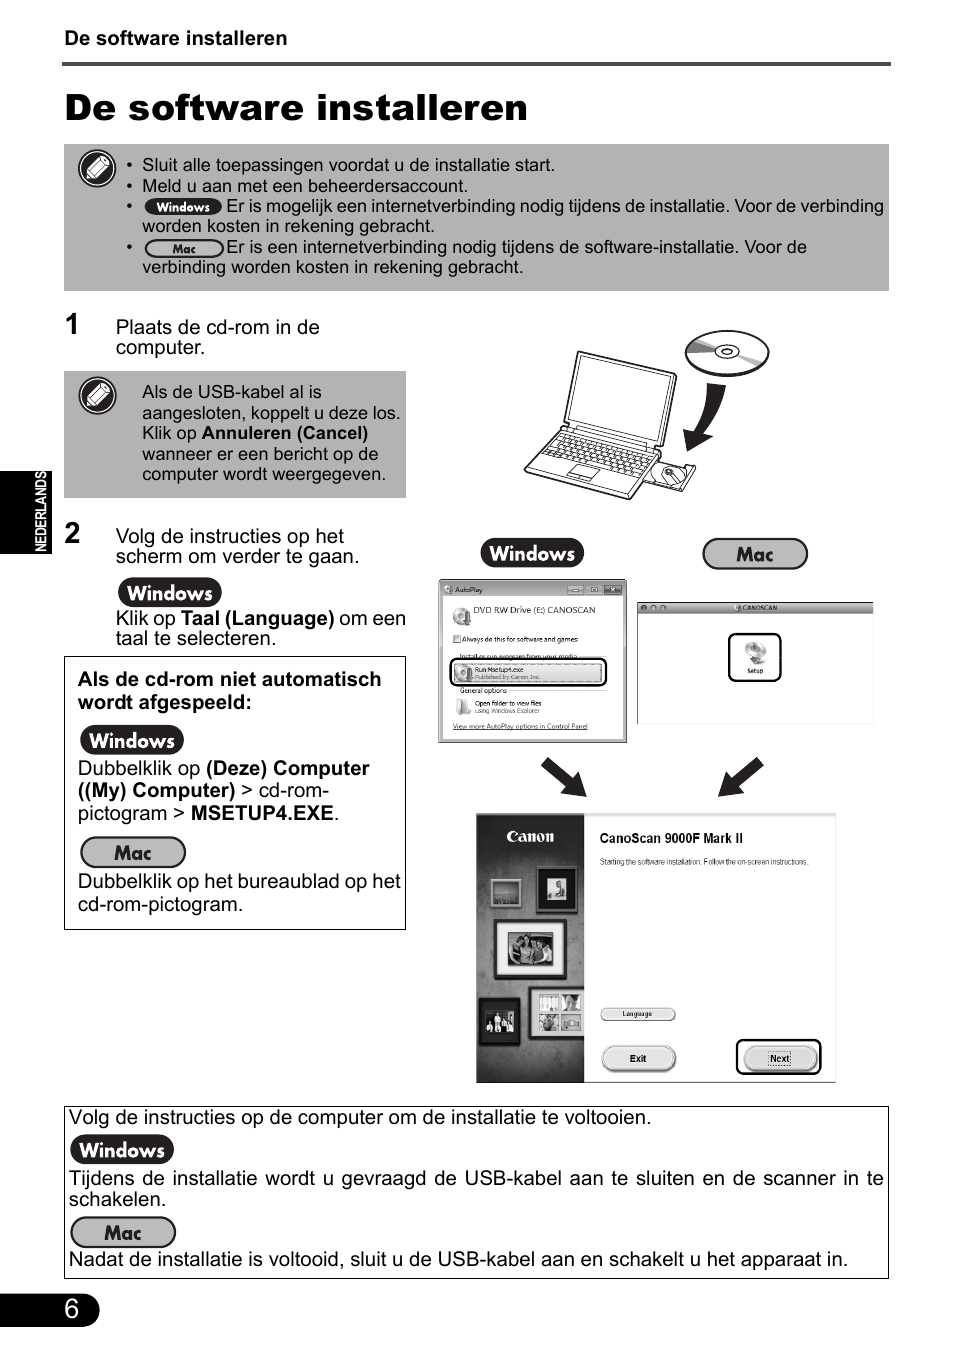 canon software manuals